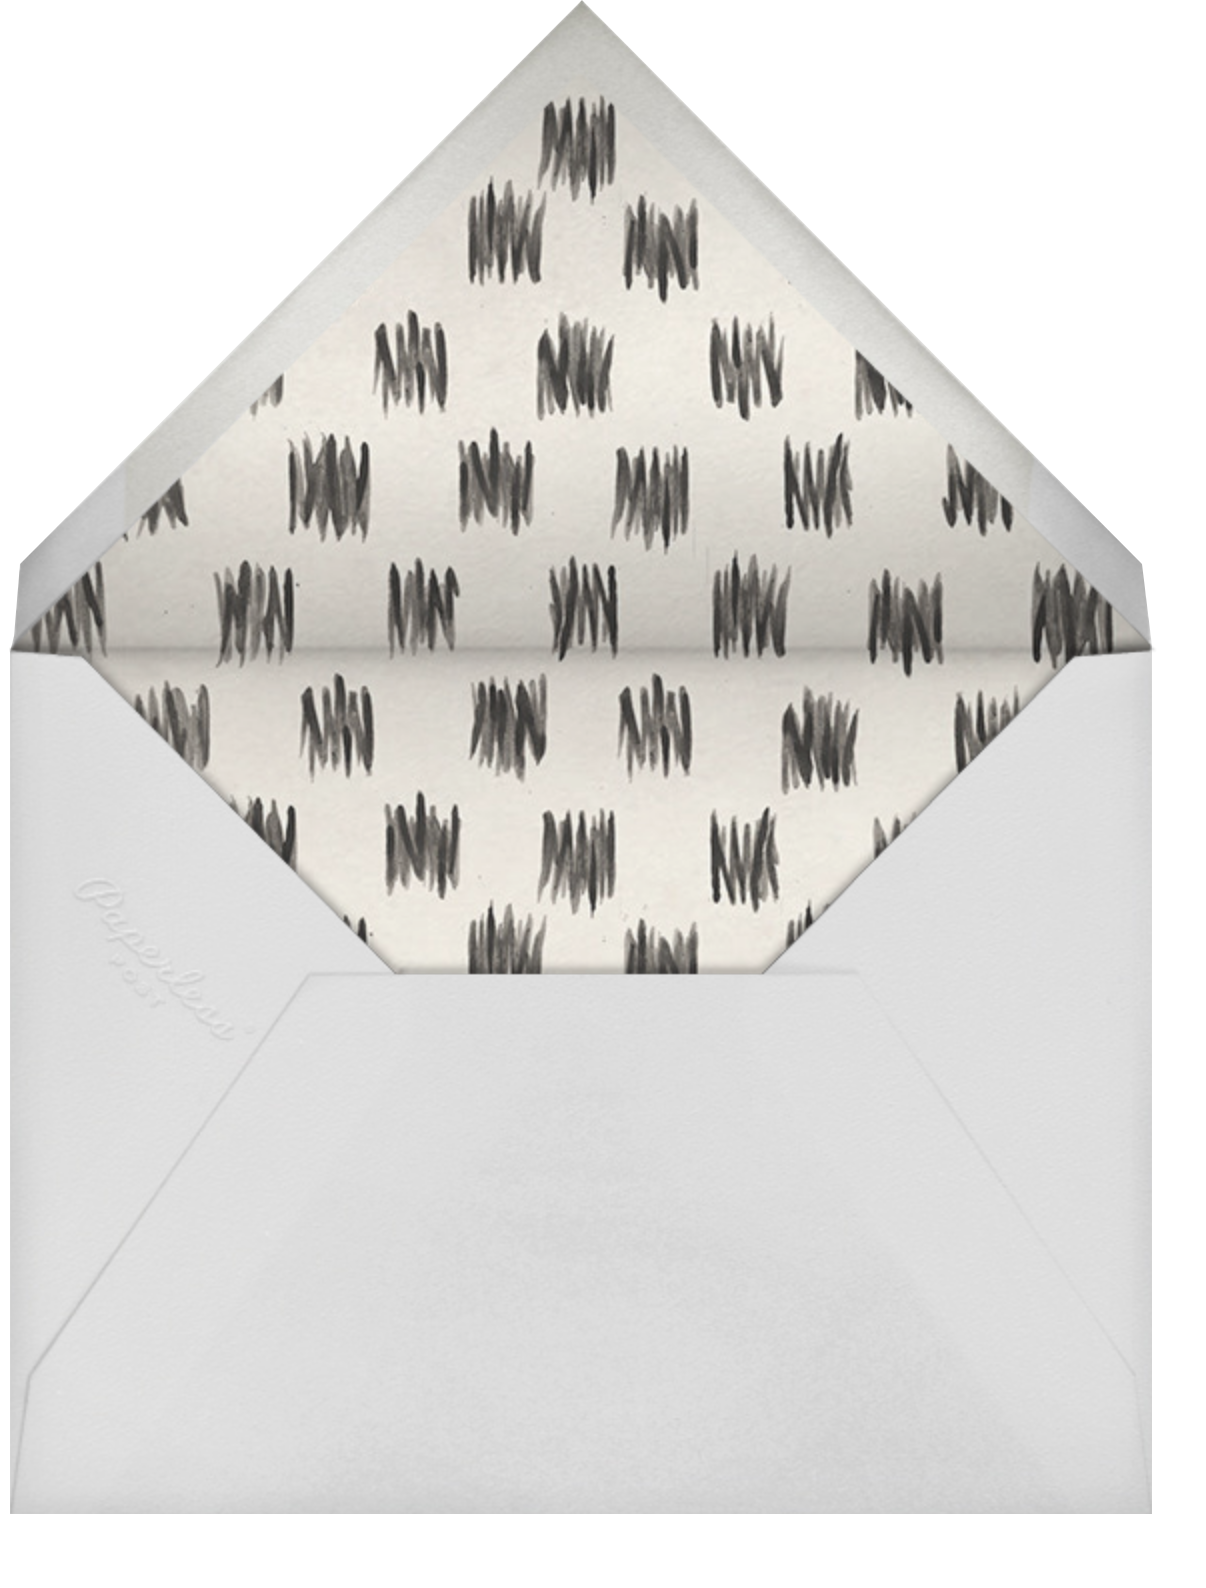 Spruce - Kelly Wearstler - Engagement party - envelope back